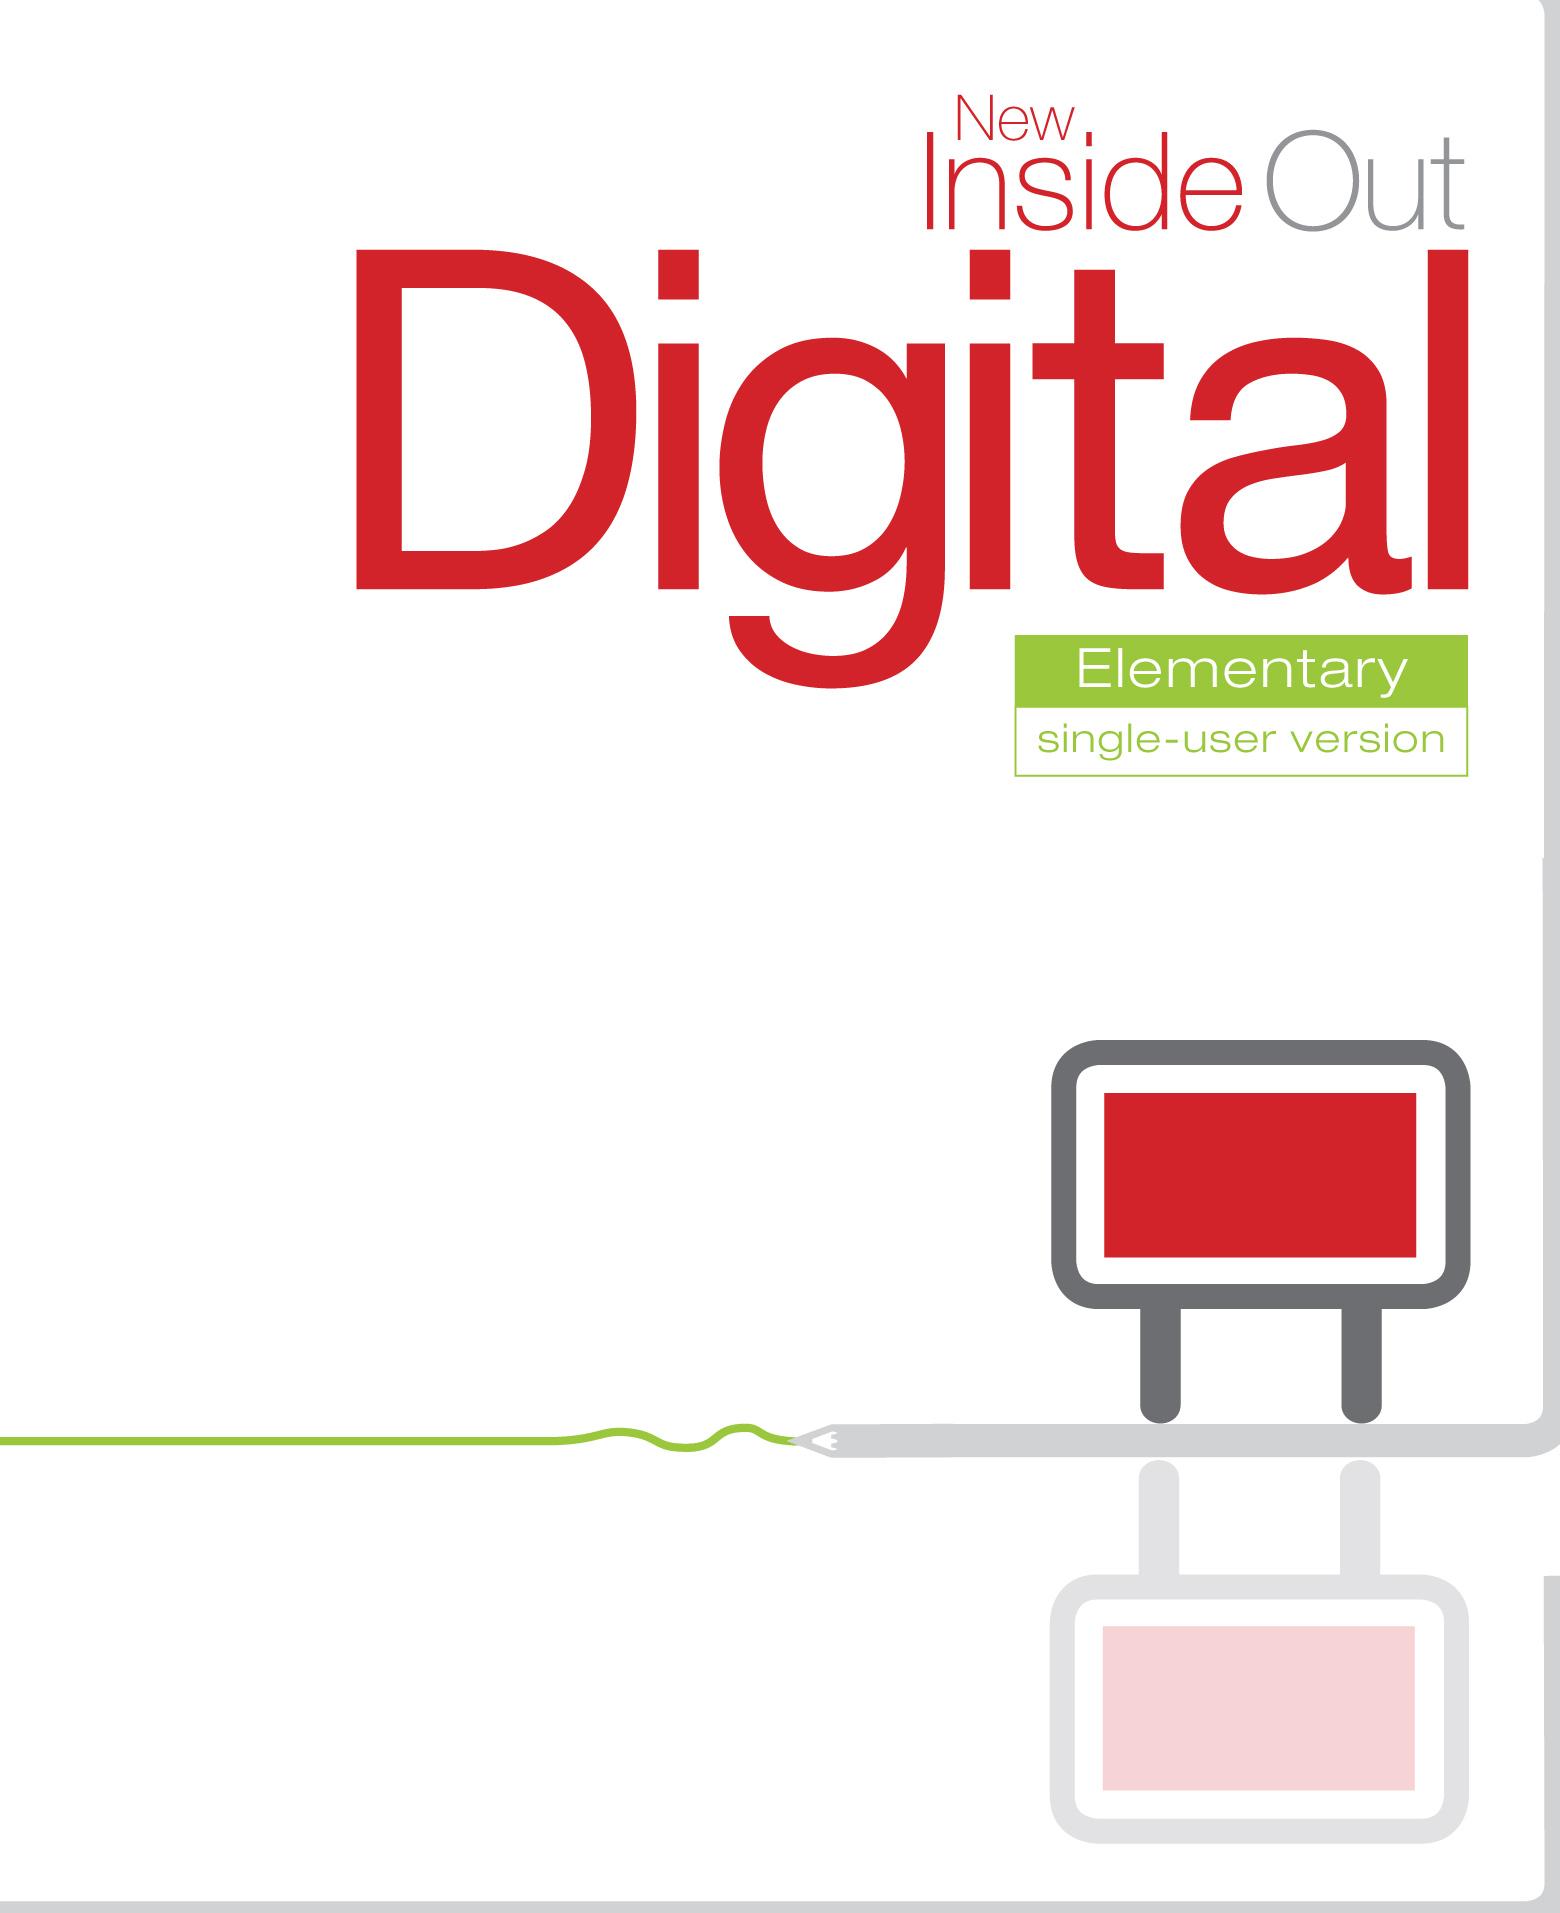 New Inside Out Elementary Digital Single User